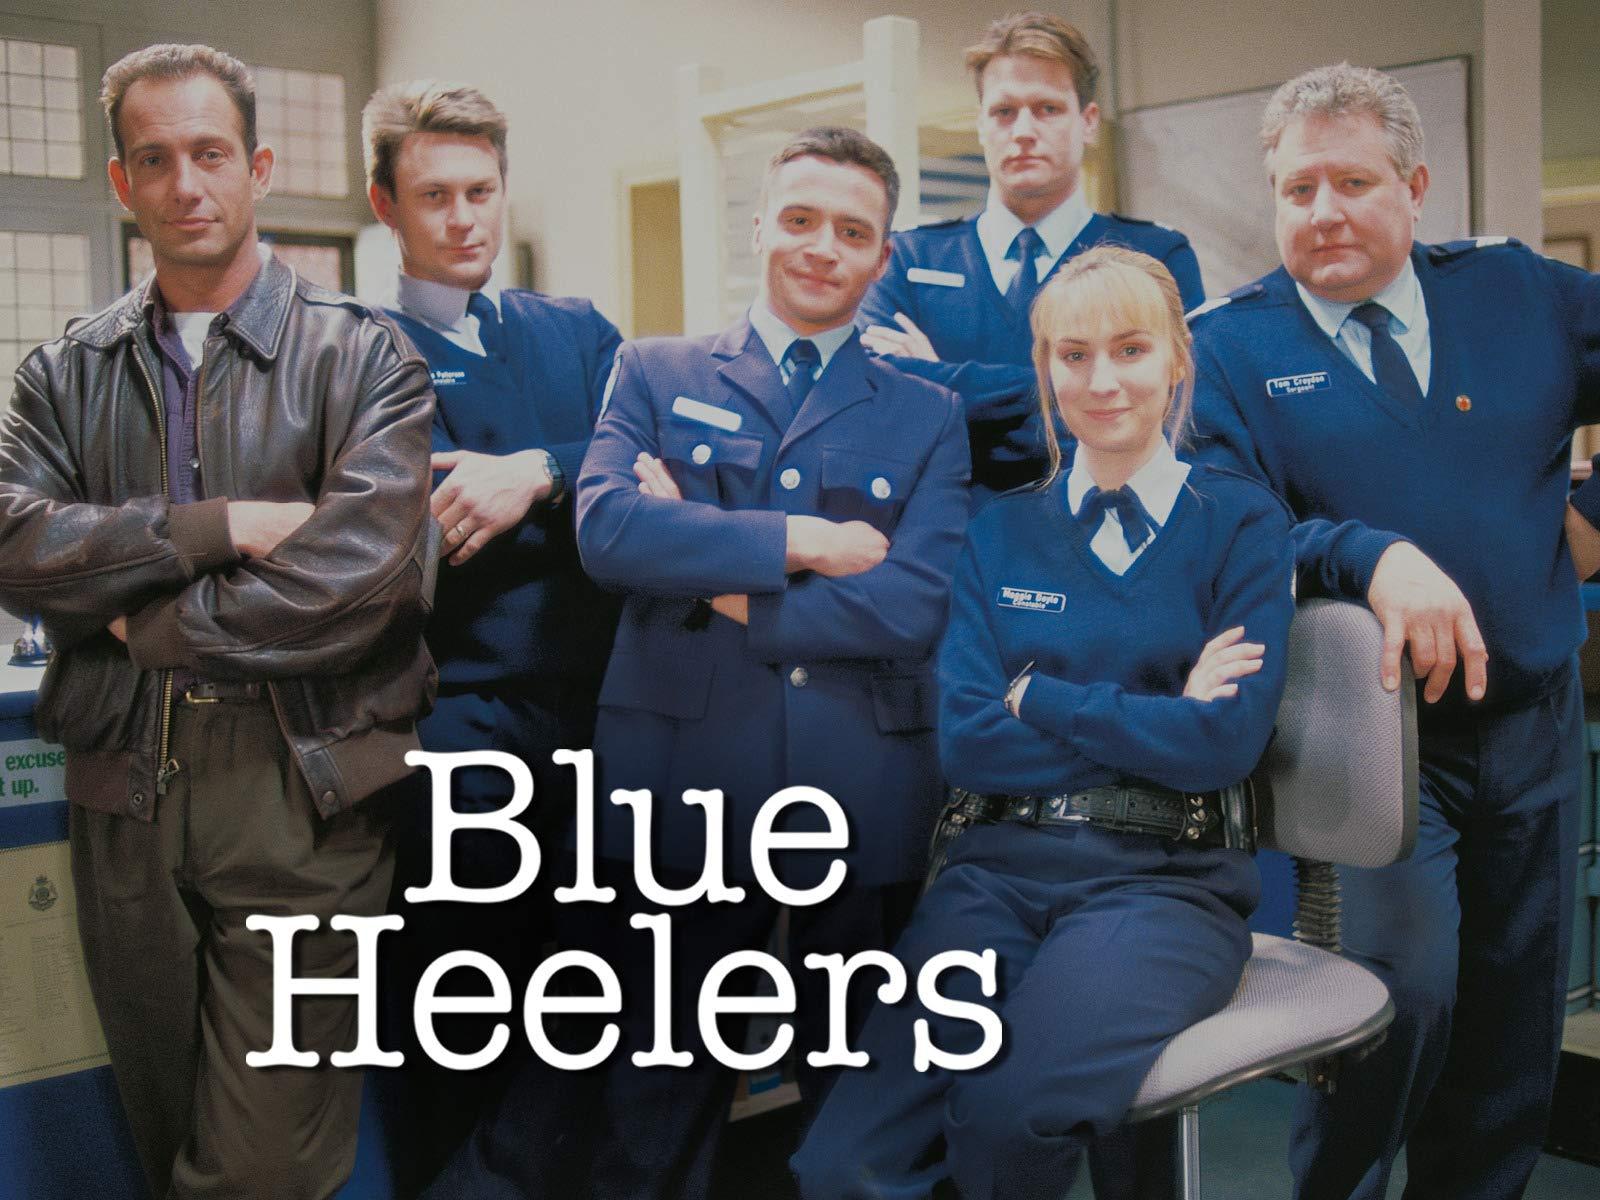 Blue Heelers - Season 2